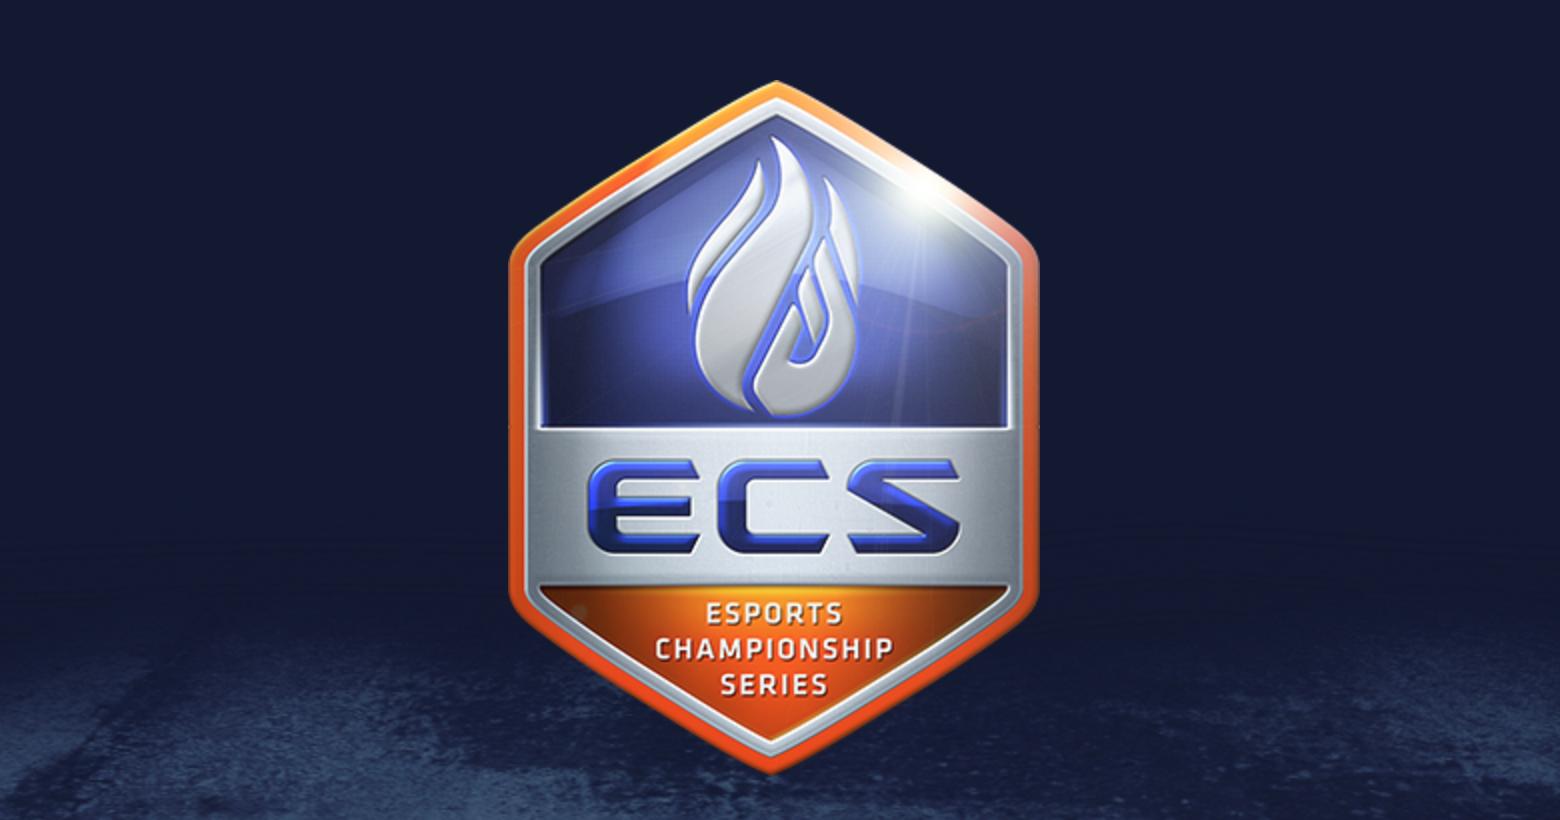 esports-championship-series